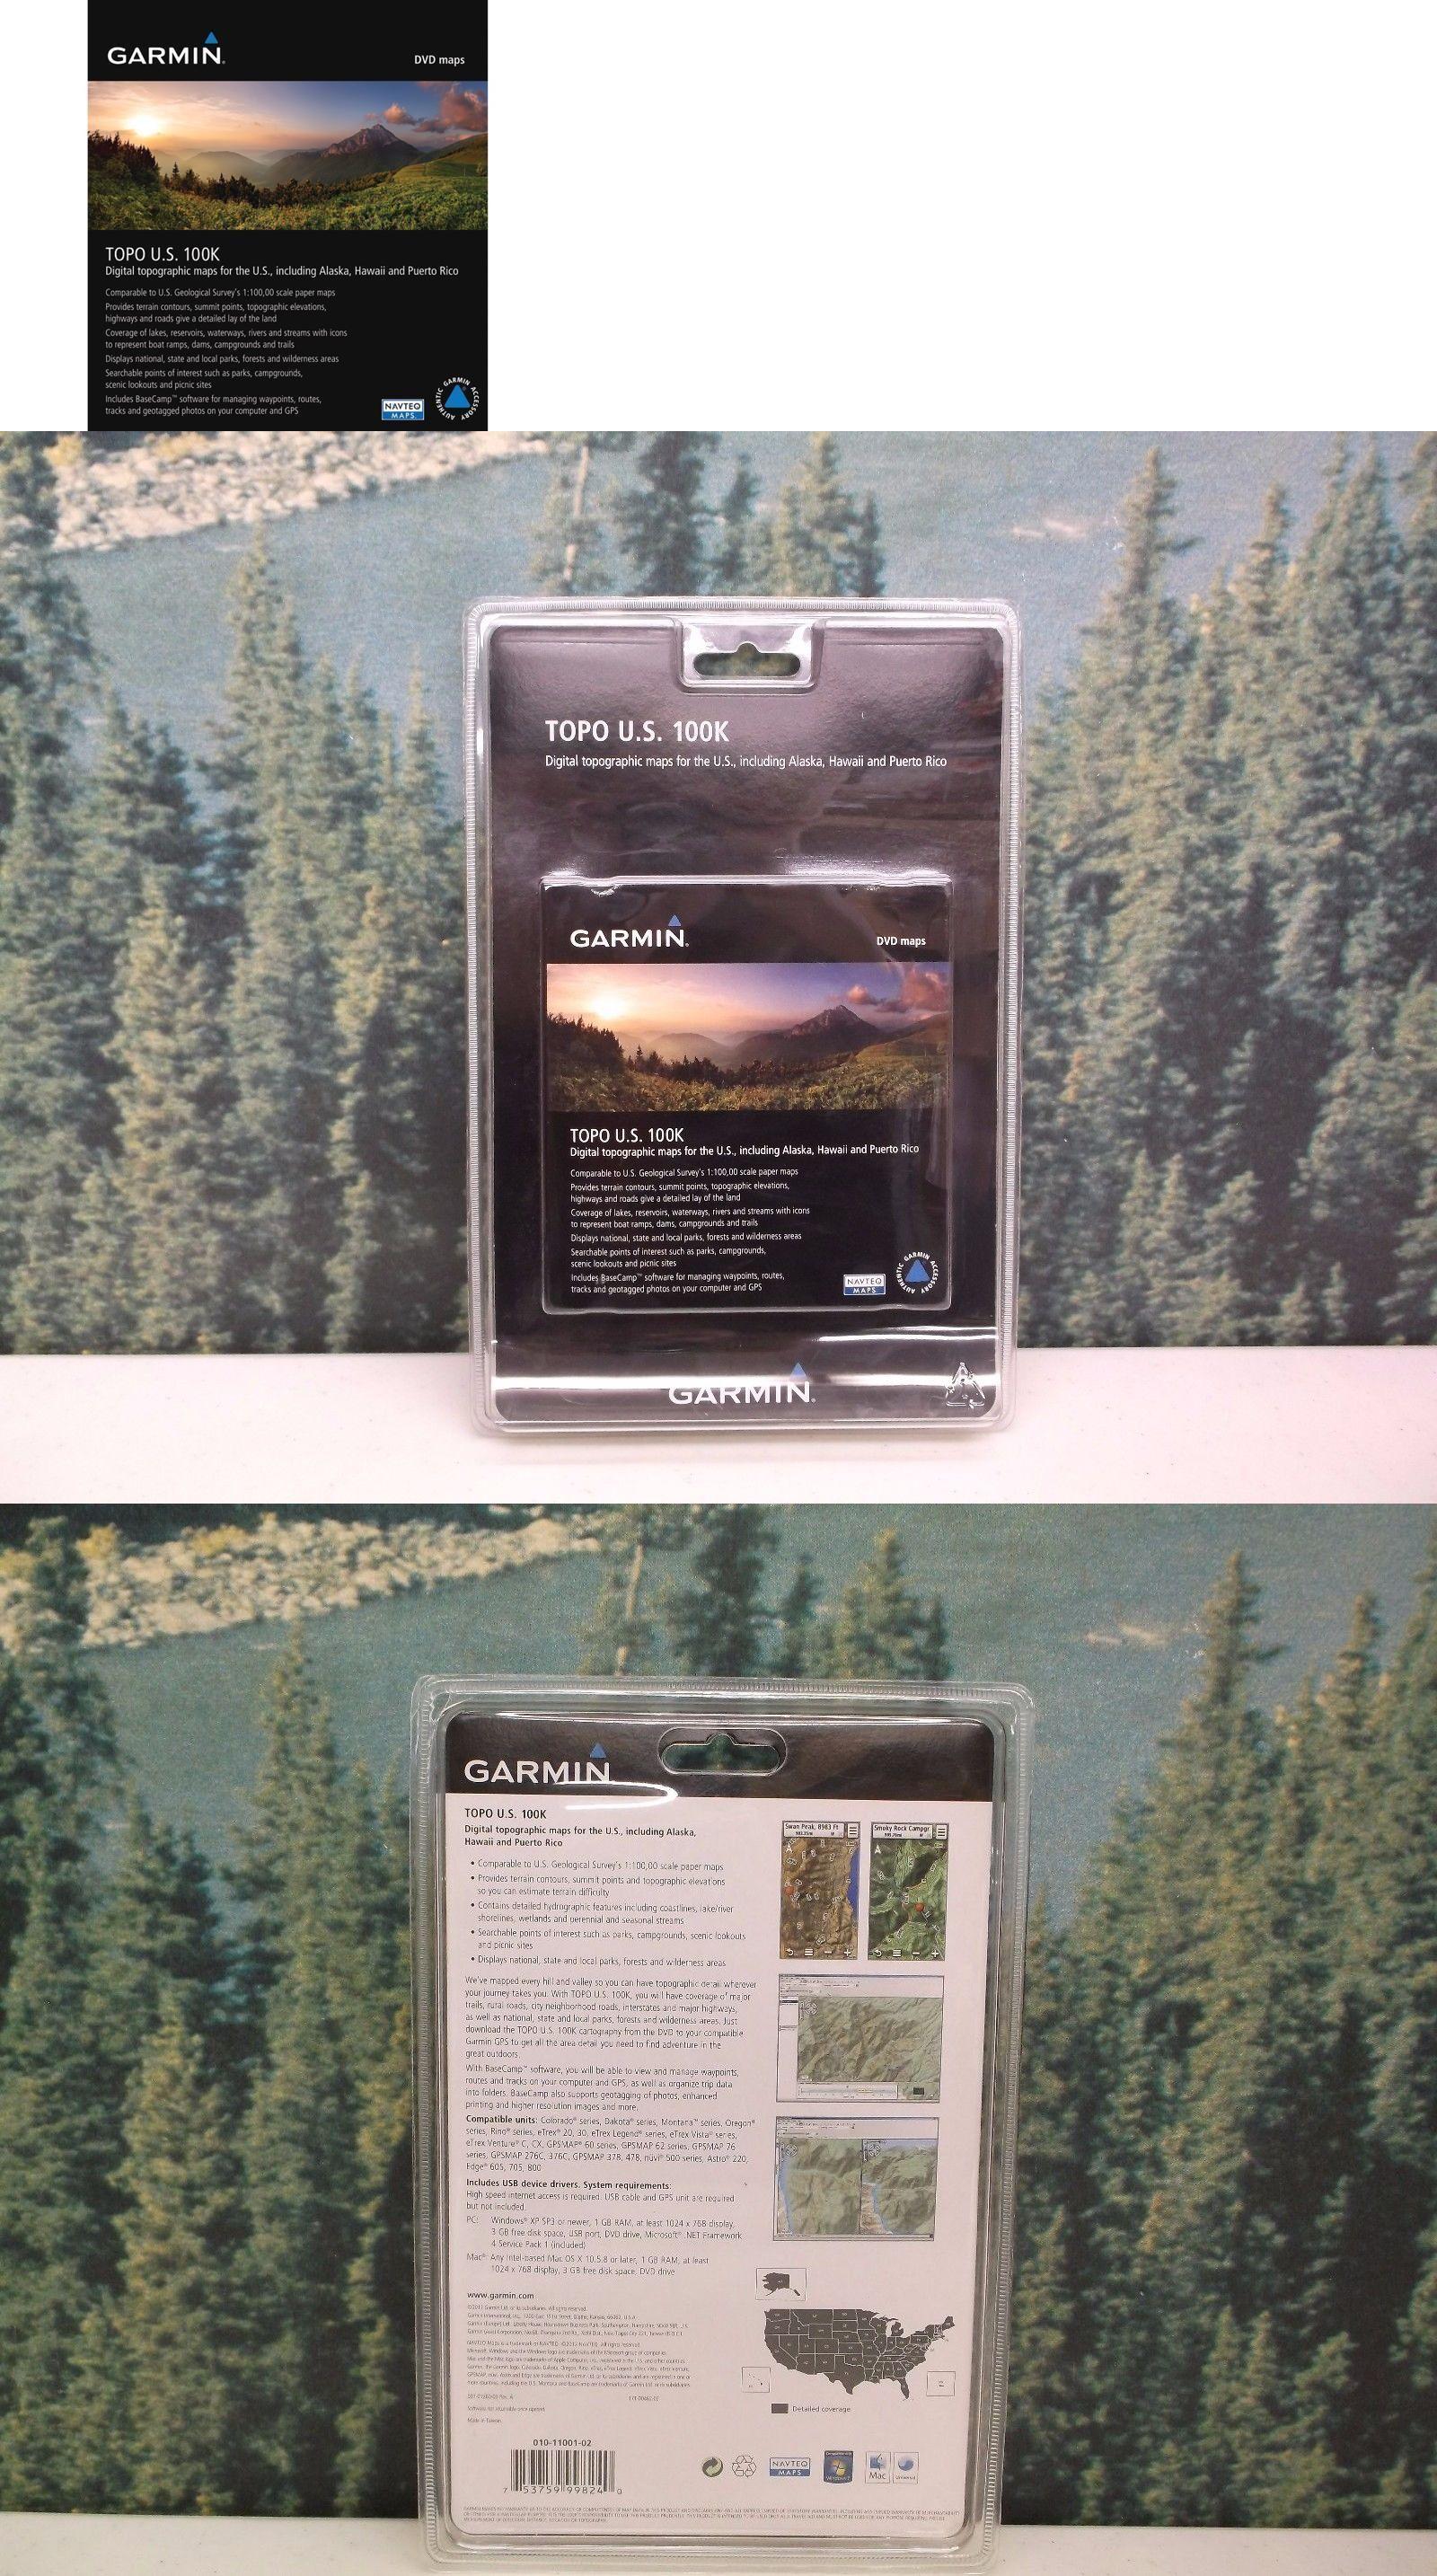 GPS Software And Maps Garmin Topo Us K Dvd Cd New Free - Garmin topo us 24k northeast dvd maps